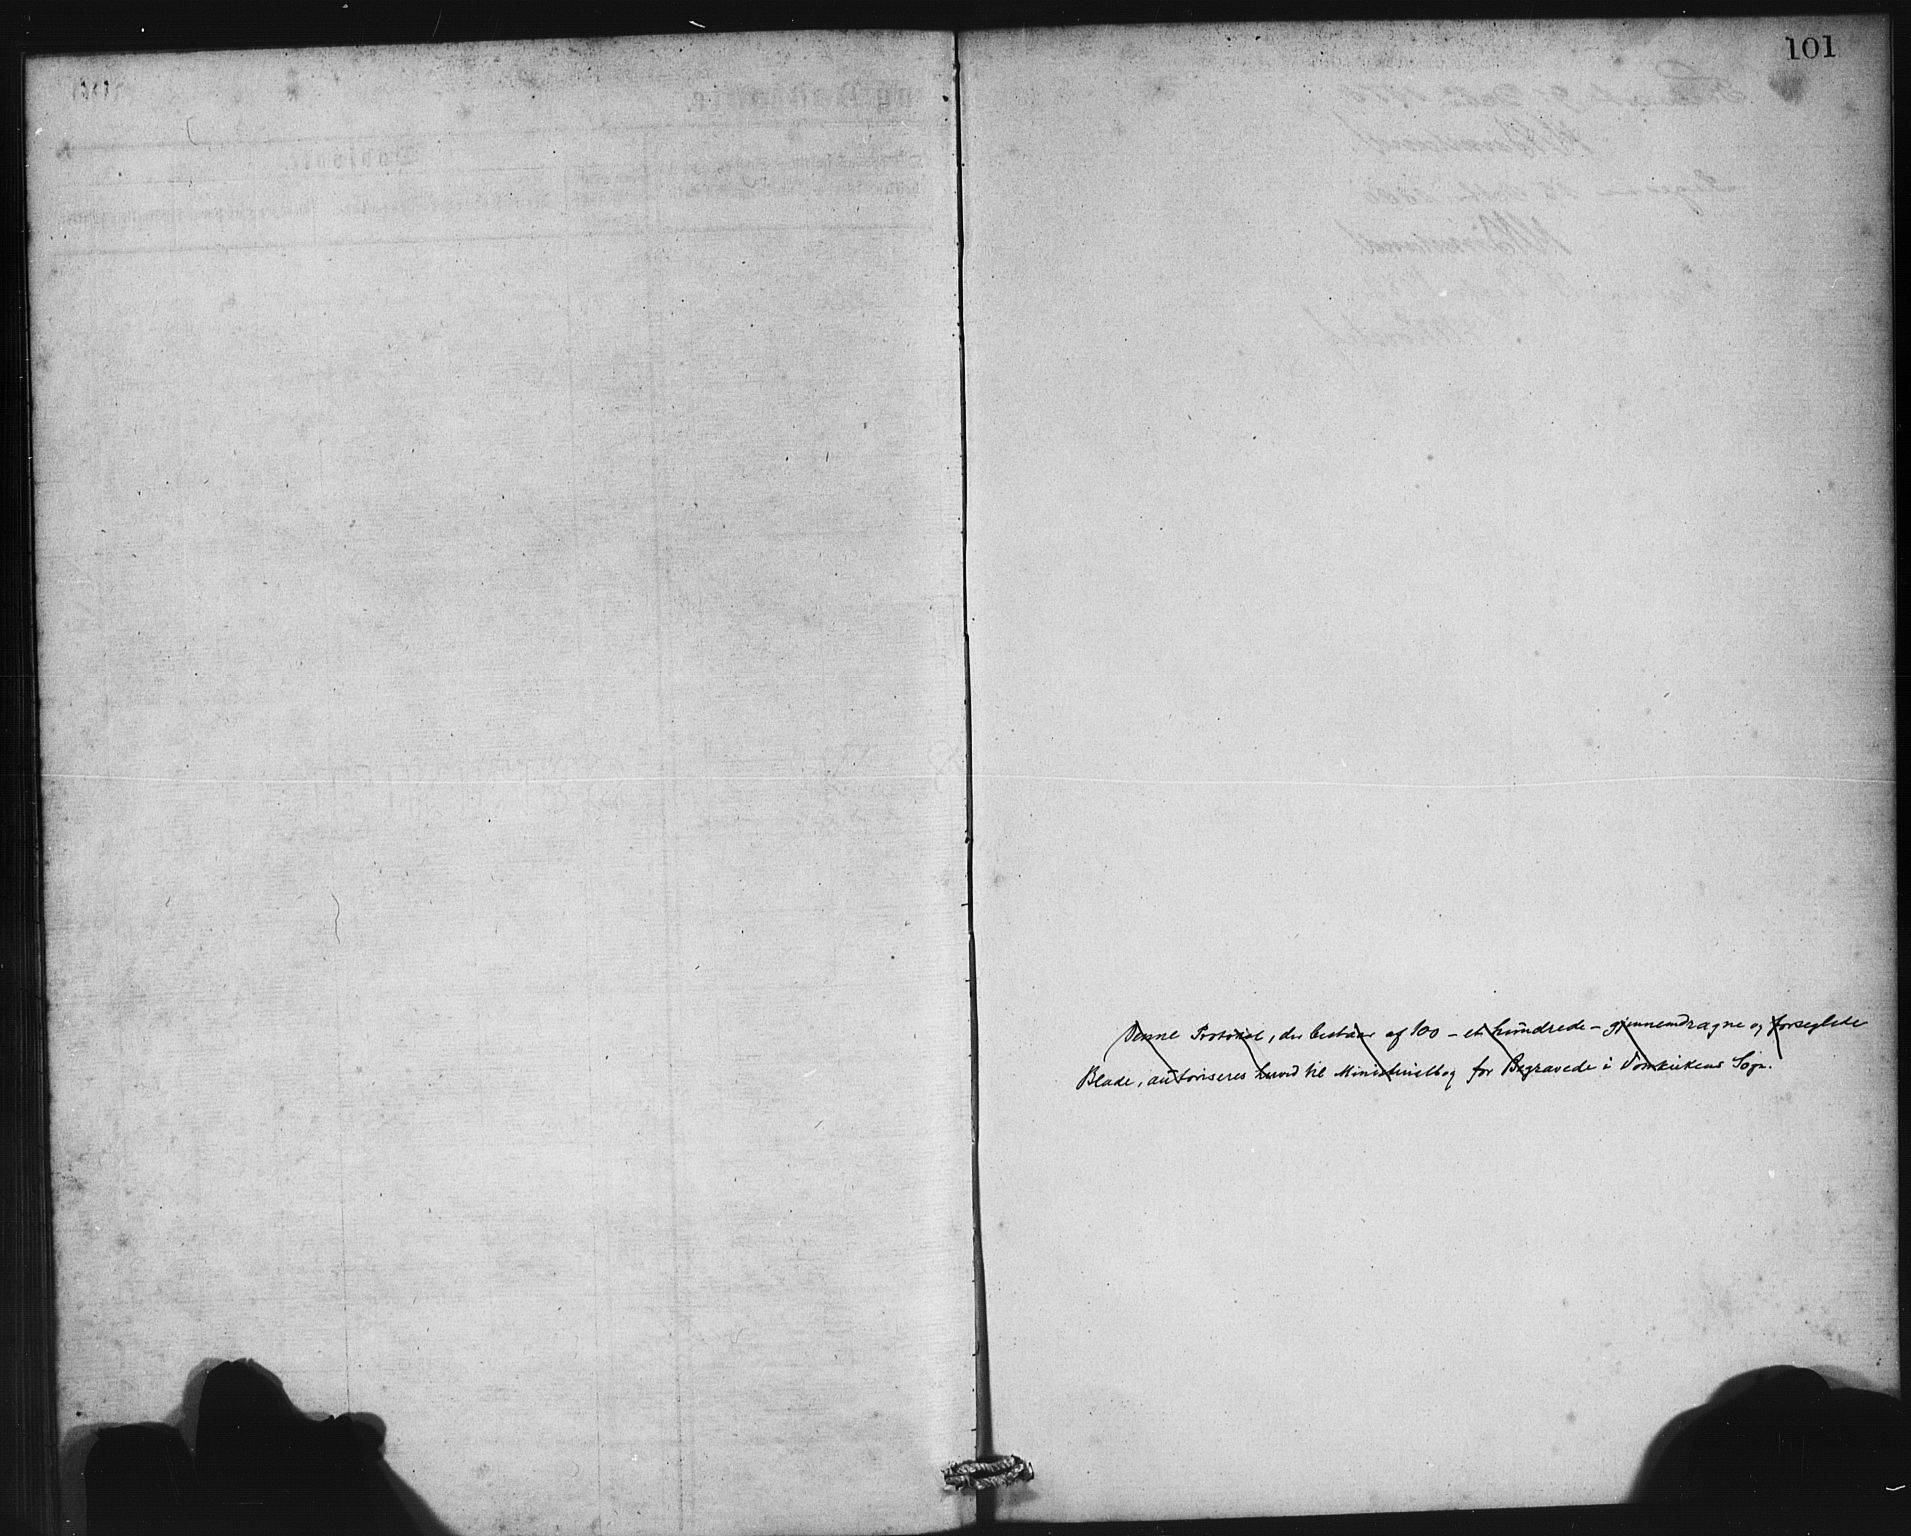 SAB, Domkirken Sokneprestembete, H/Haa: Ministerialbok nr. E 4, 1877-1881, s. 101